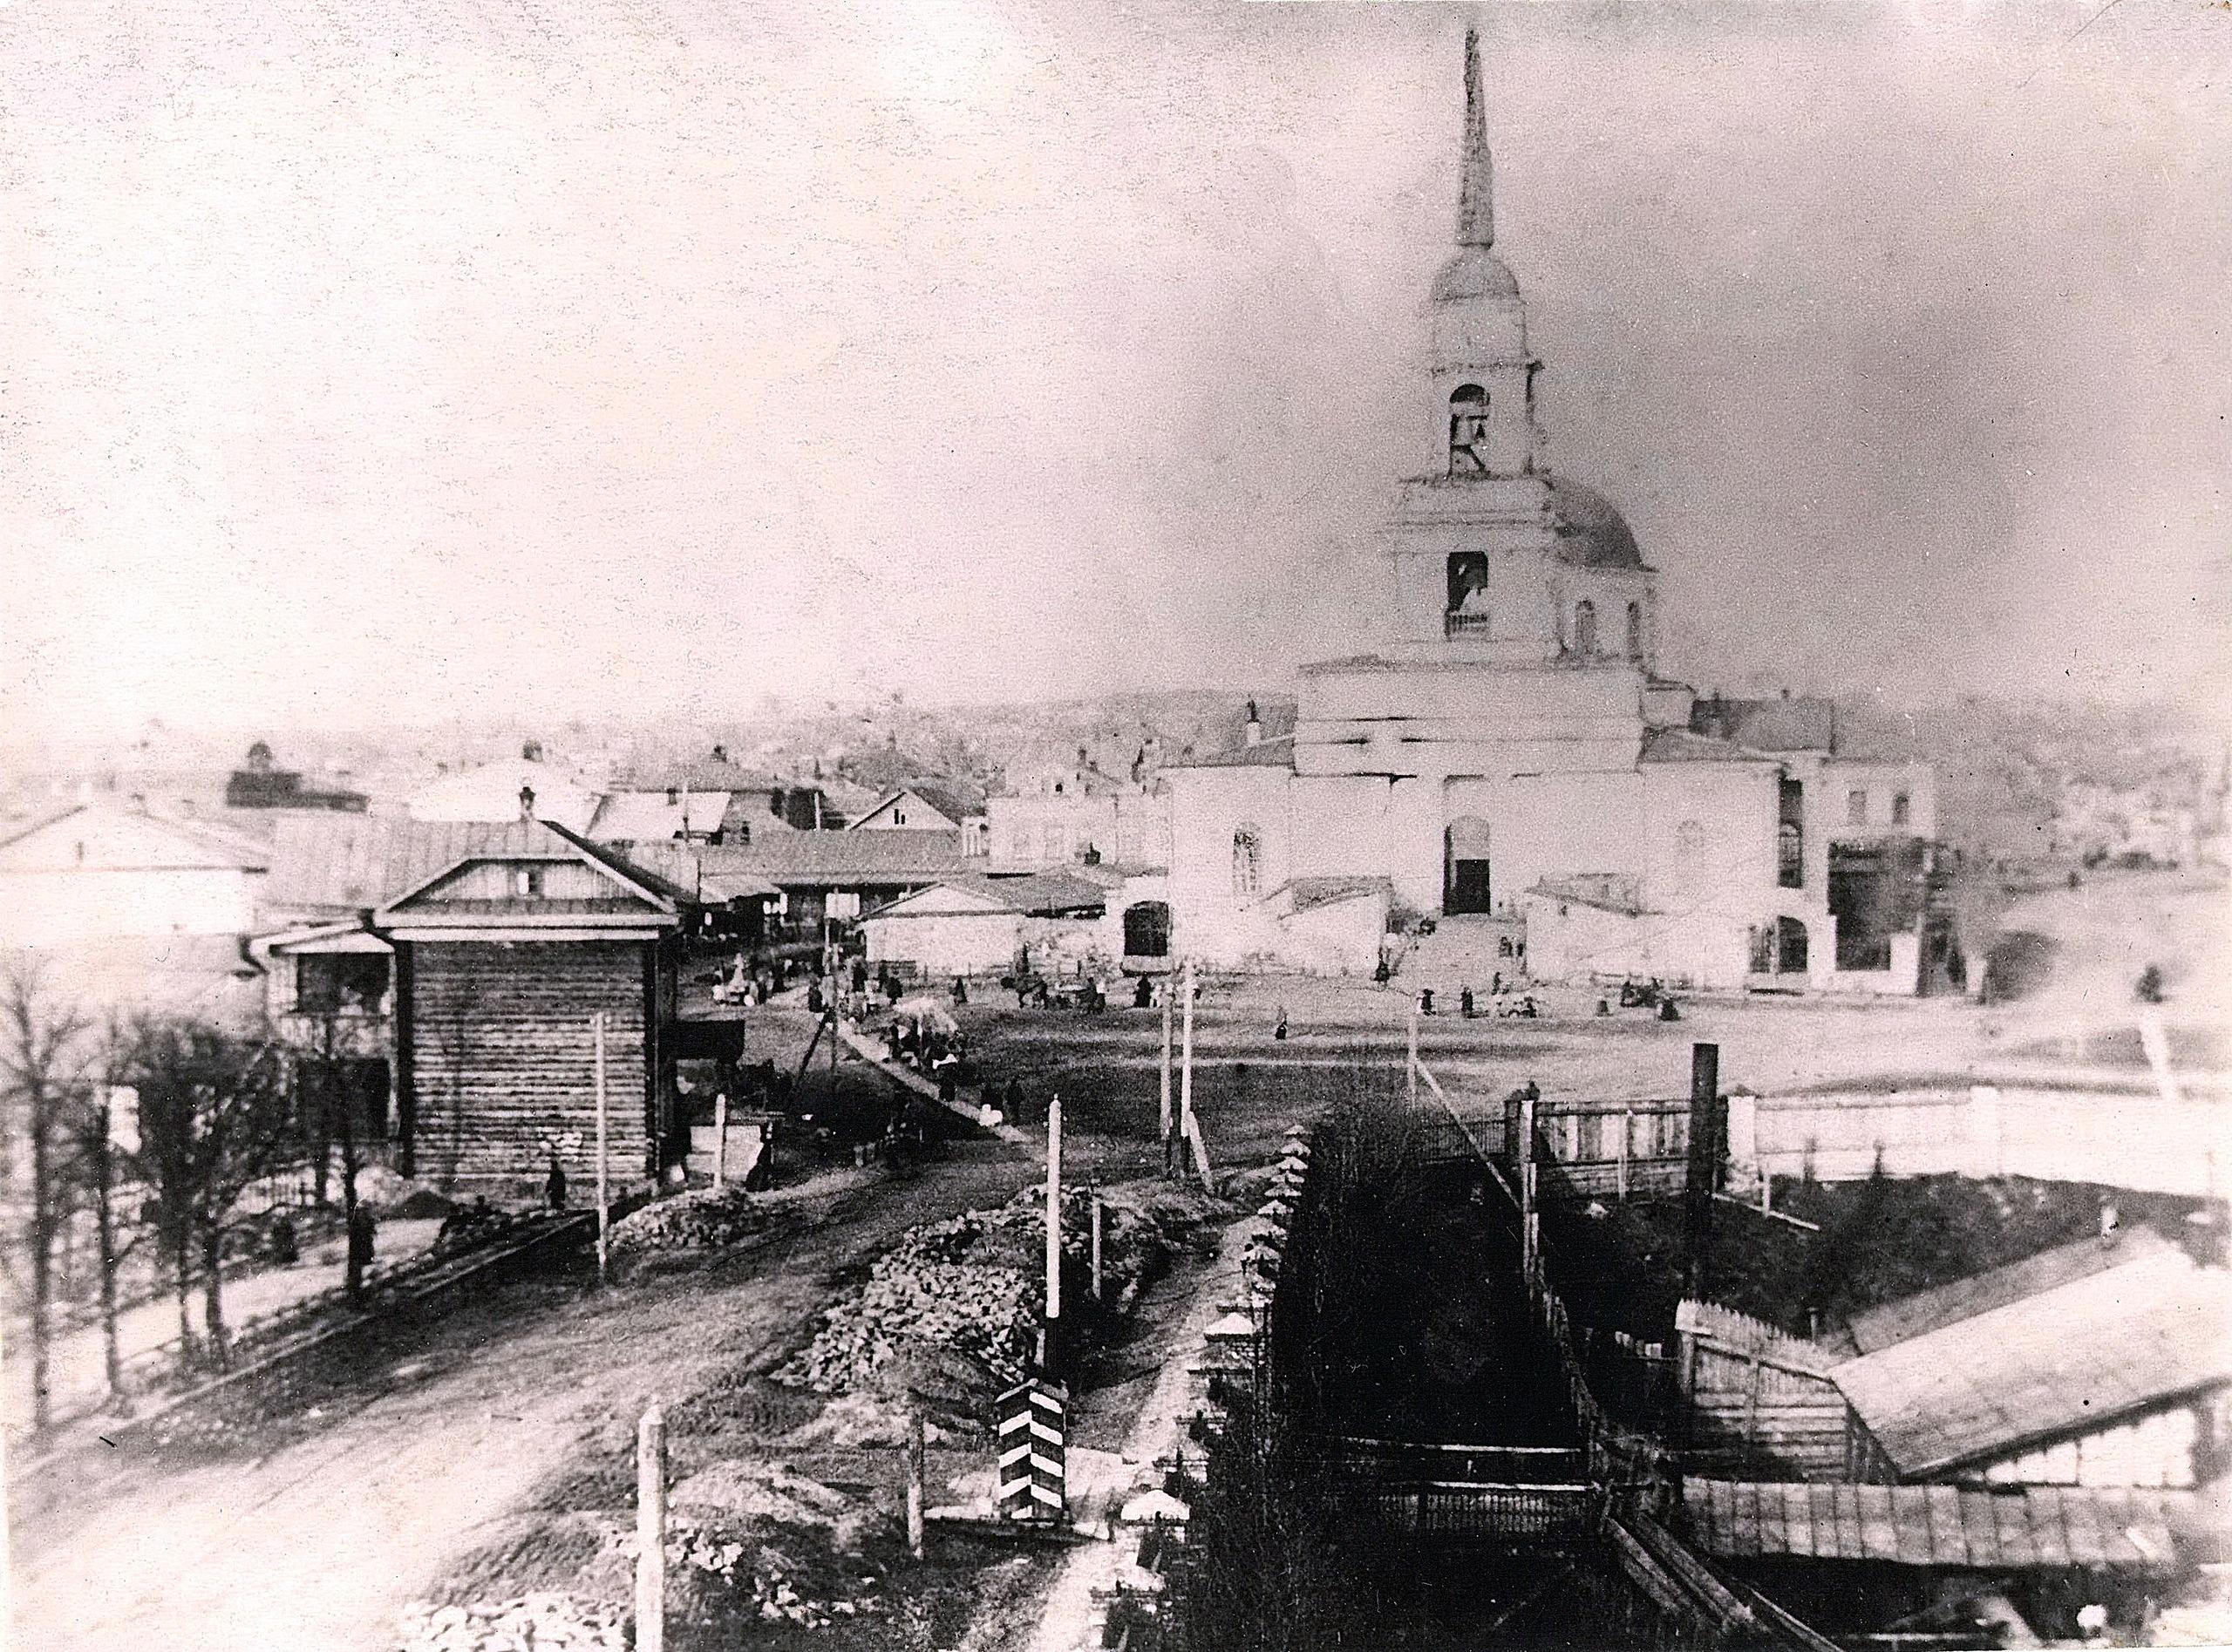 Вид на плотину, завод и Благовещенский собор